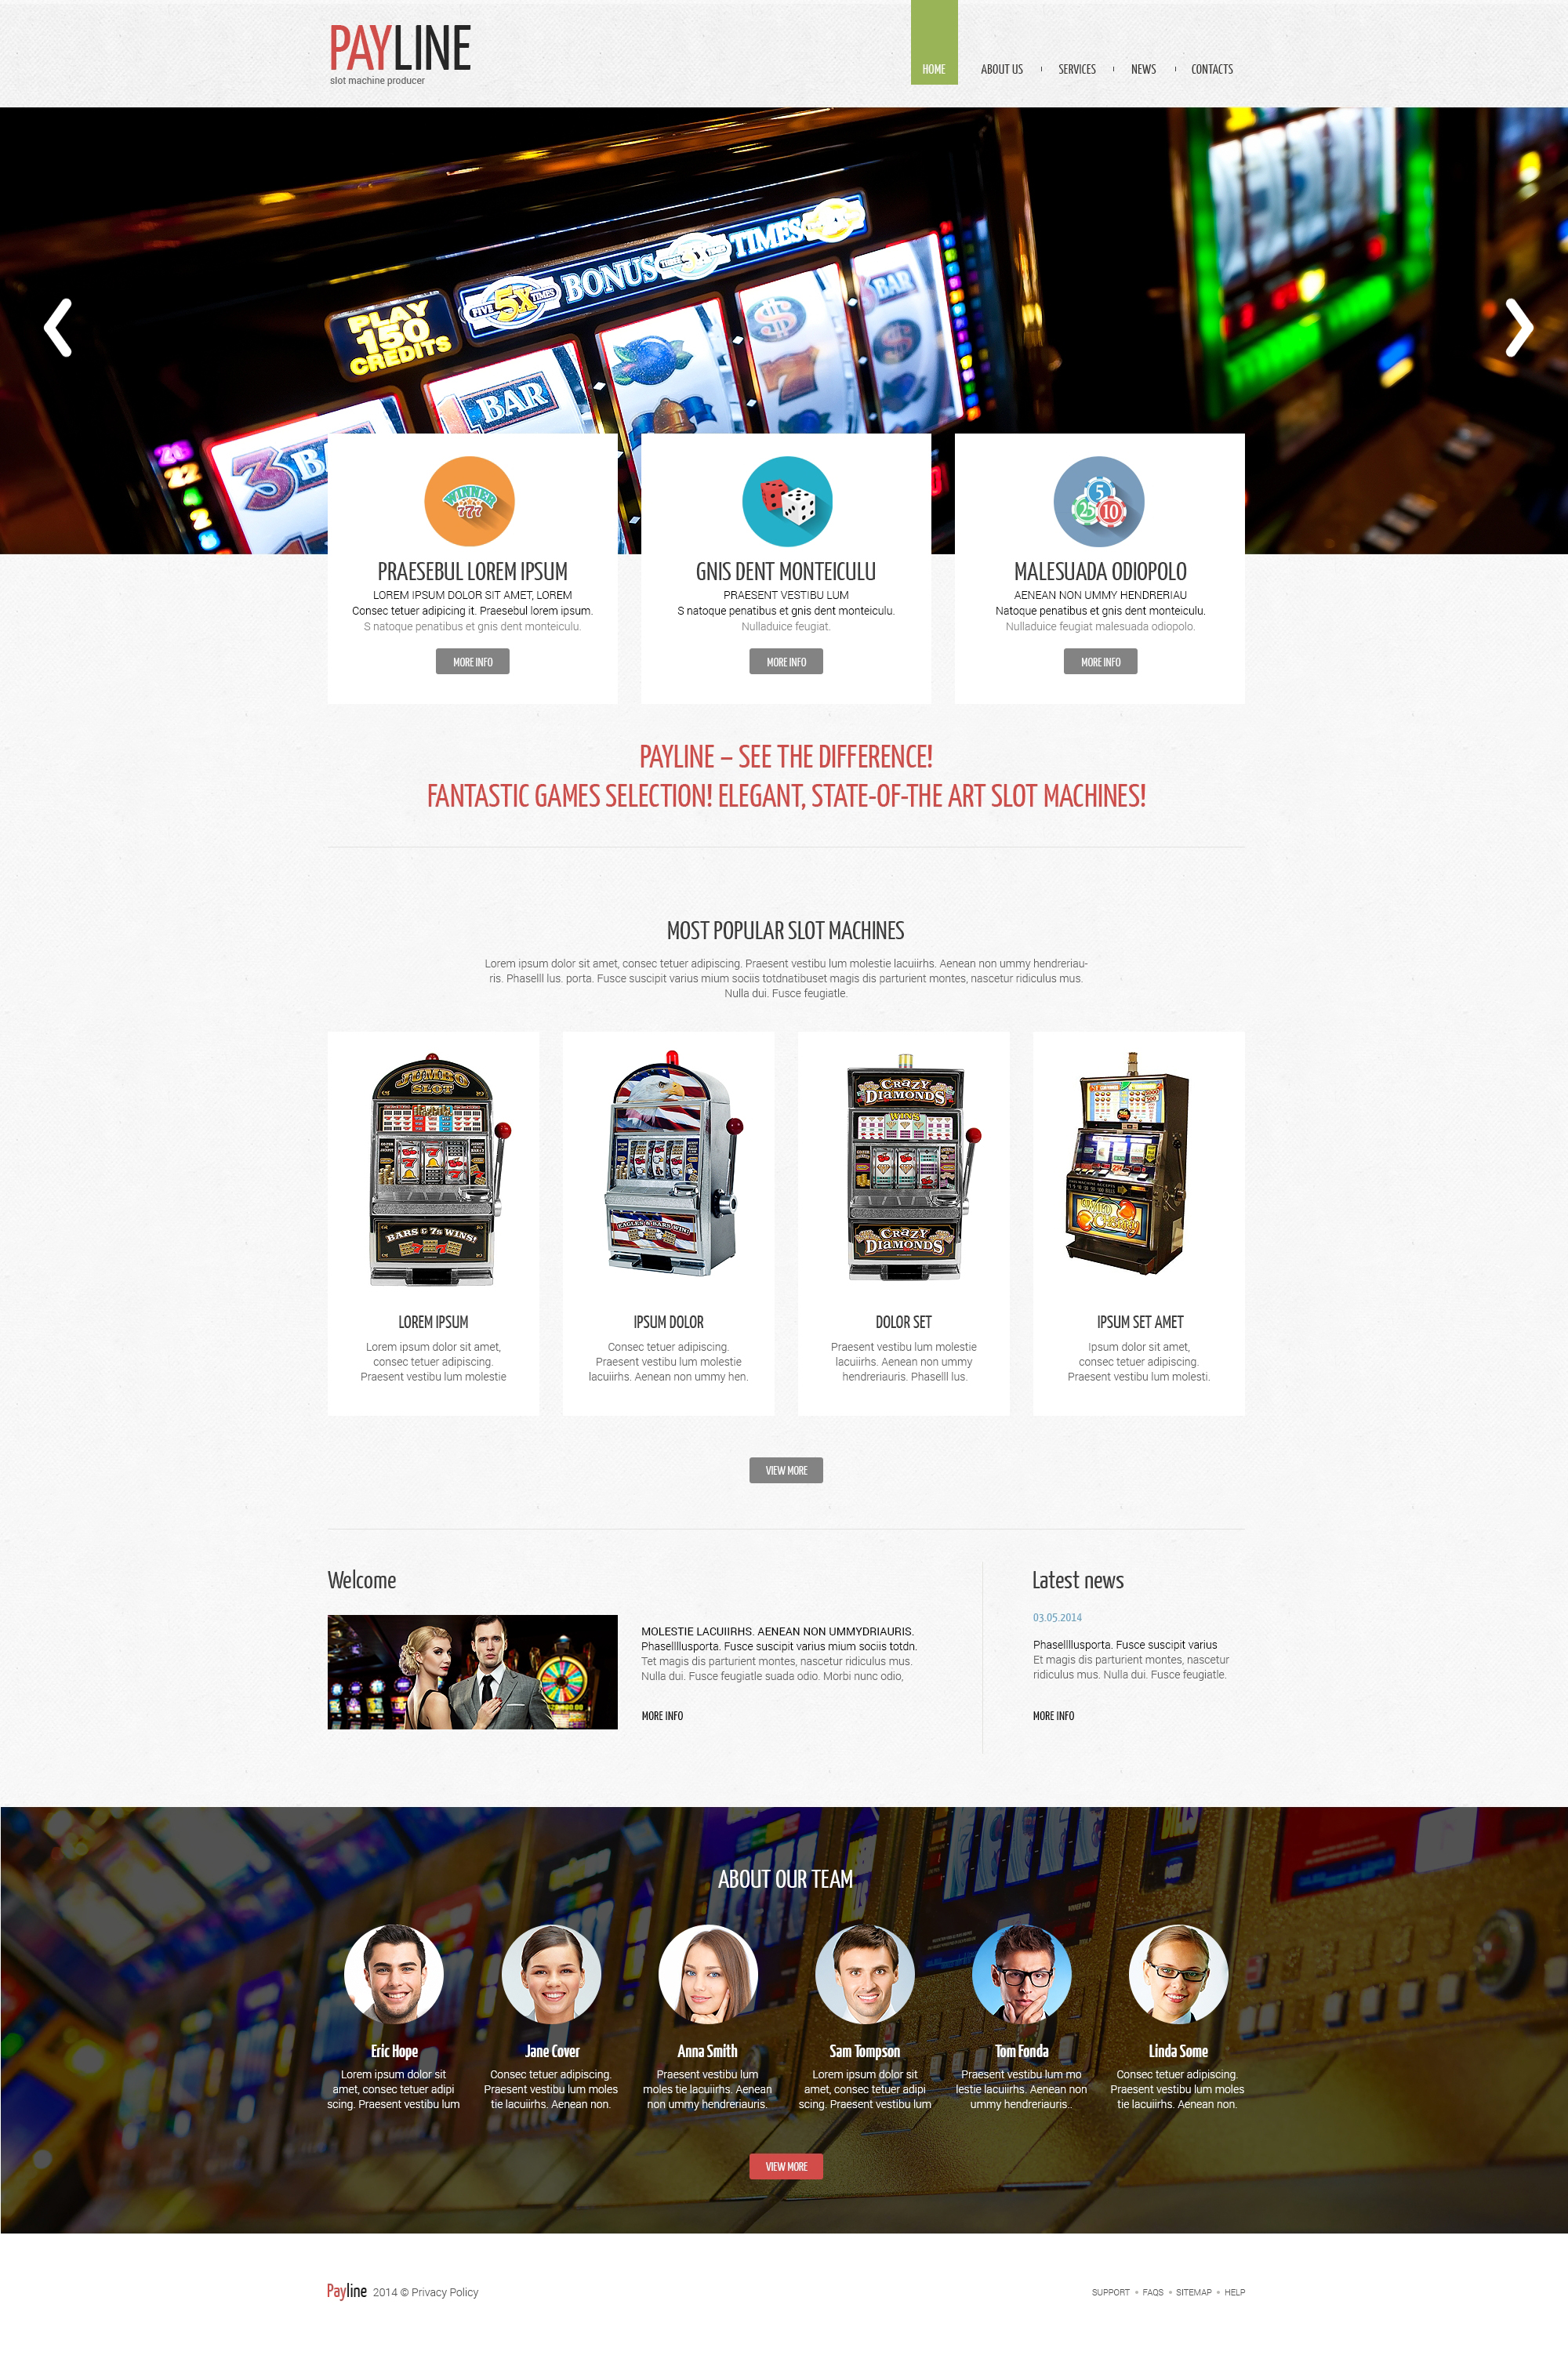 Plantilla Web Responsive para Sitio de Máquinas tragamonedas #51014 - captura de pantalla